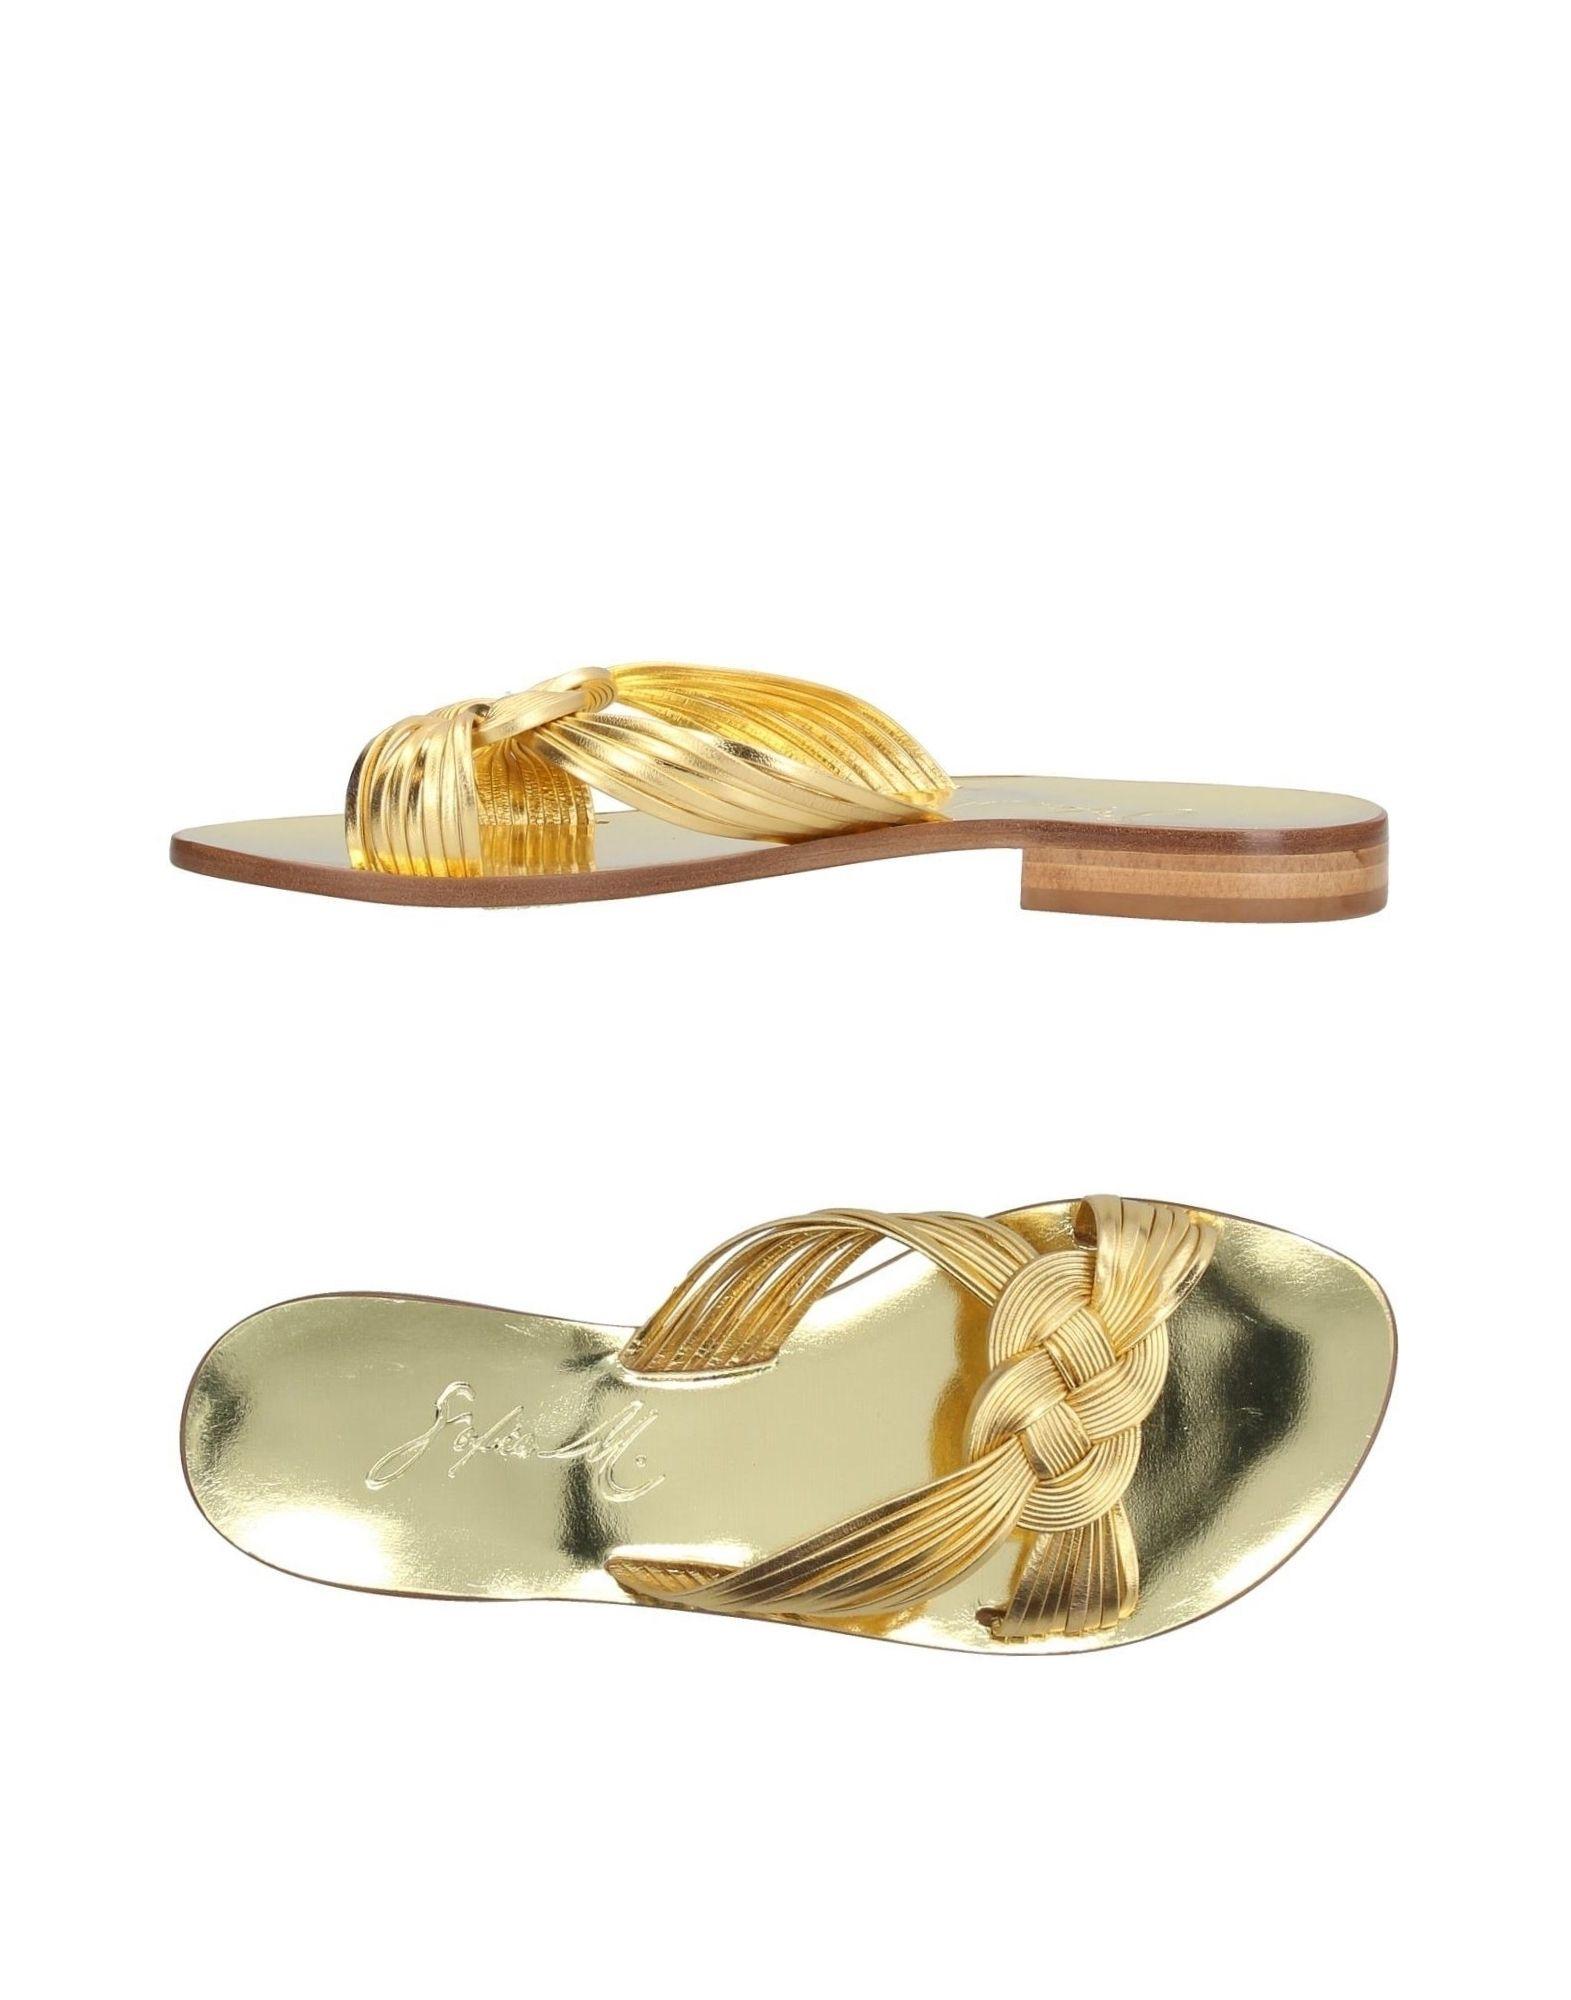 Sofia M. Sandalen Damen  11400504JX Gute Qualität beliebte Schuhe